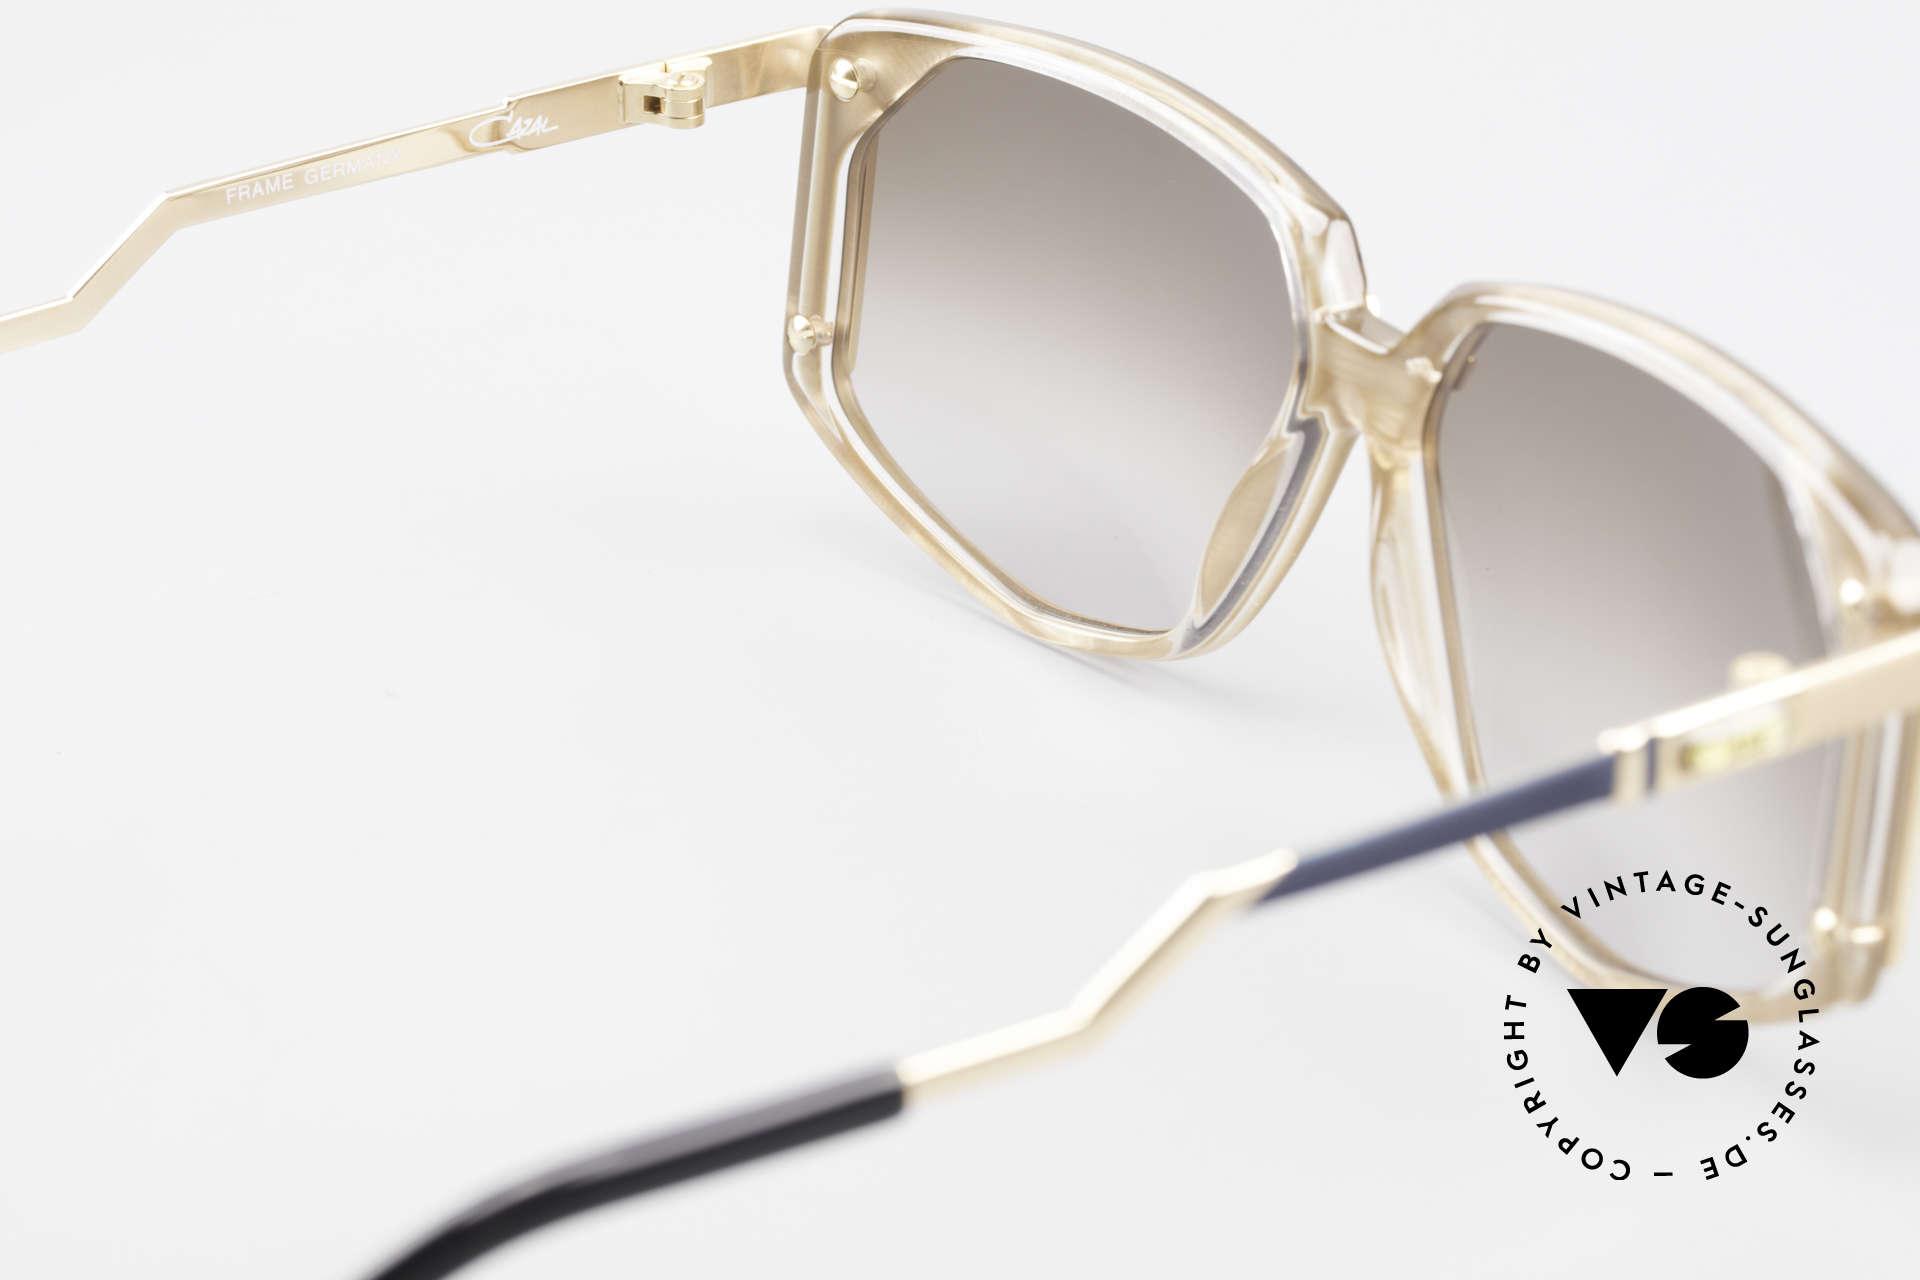 Cazal 346 Hip Hop Designer Sunglasses, Size: medium, Made for Men and Women